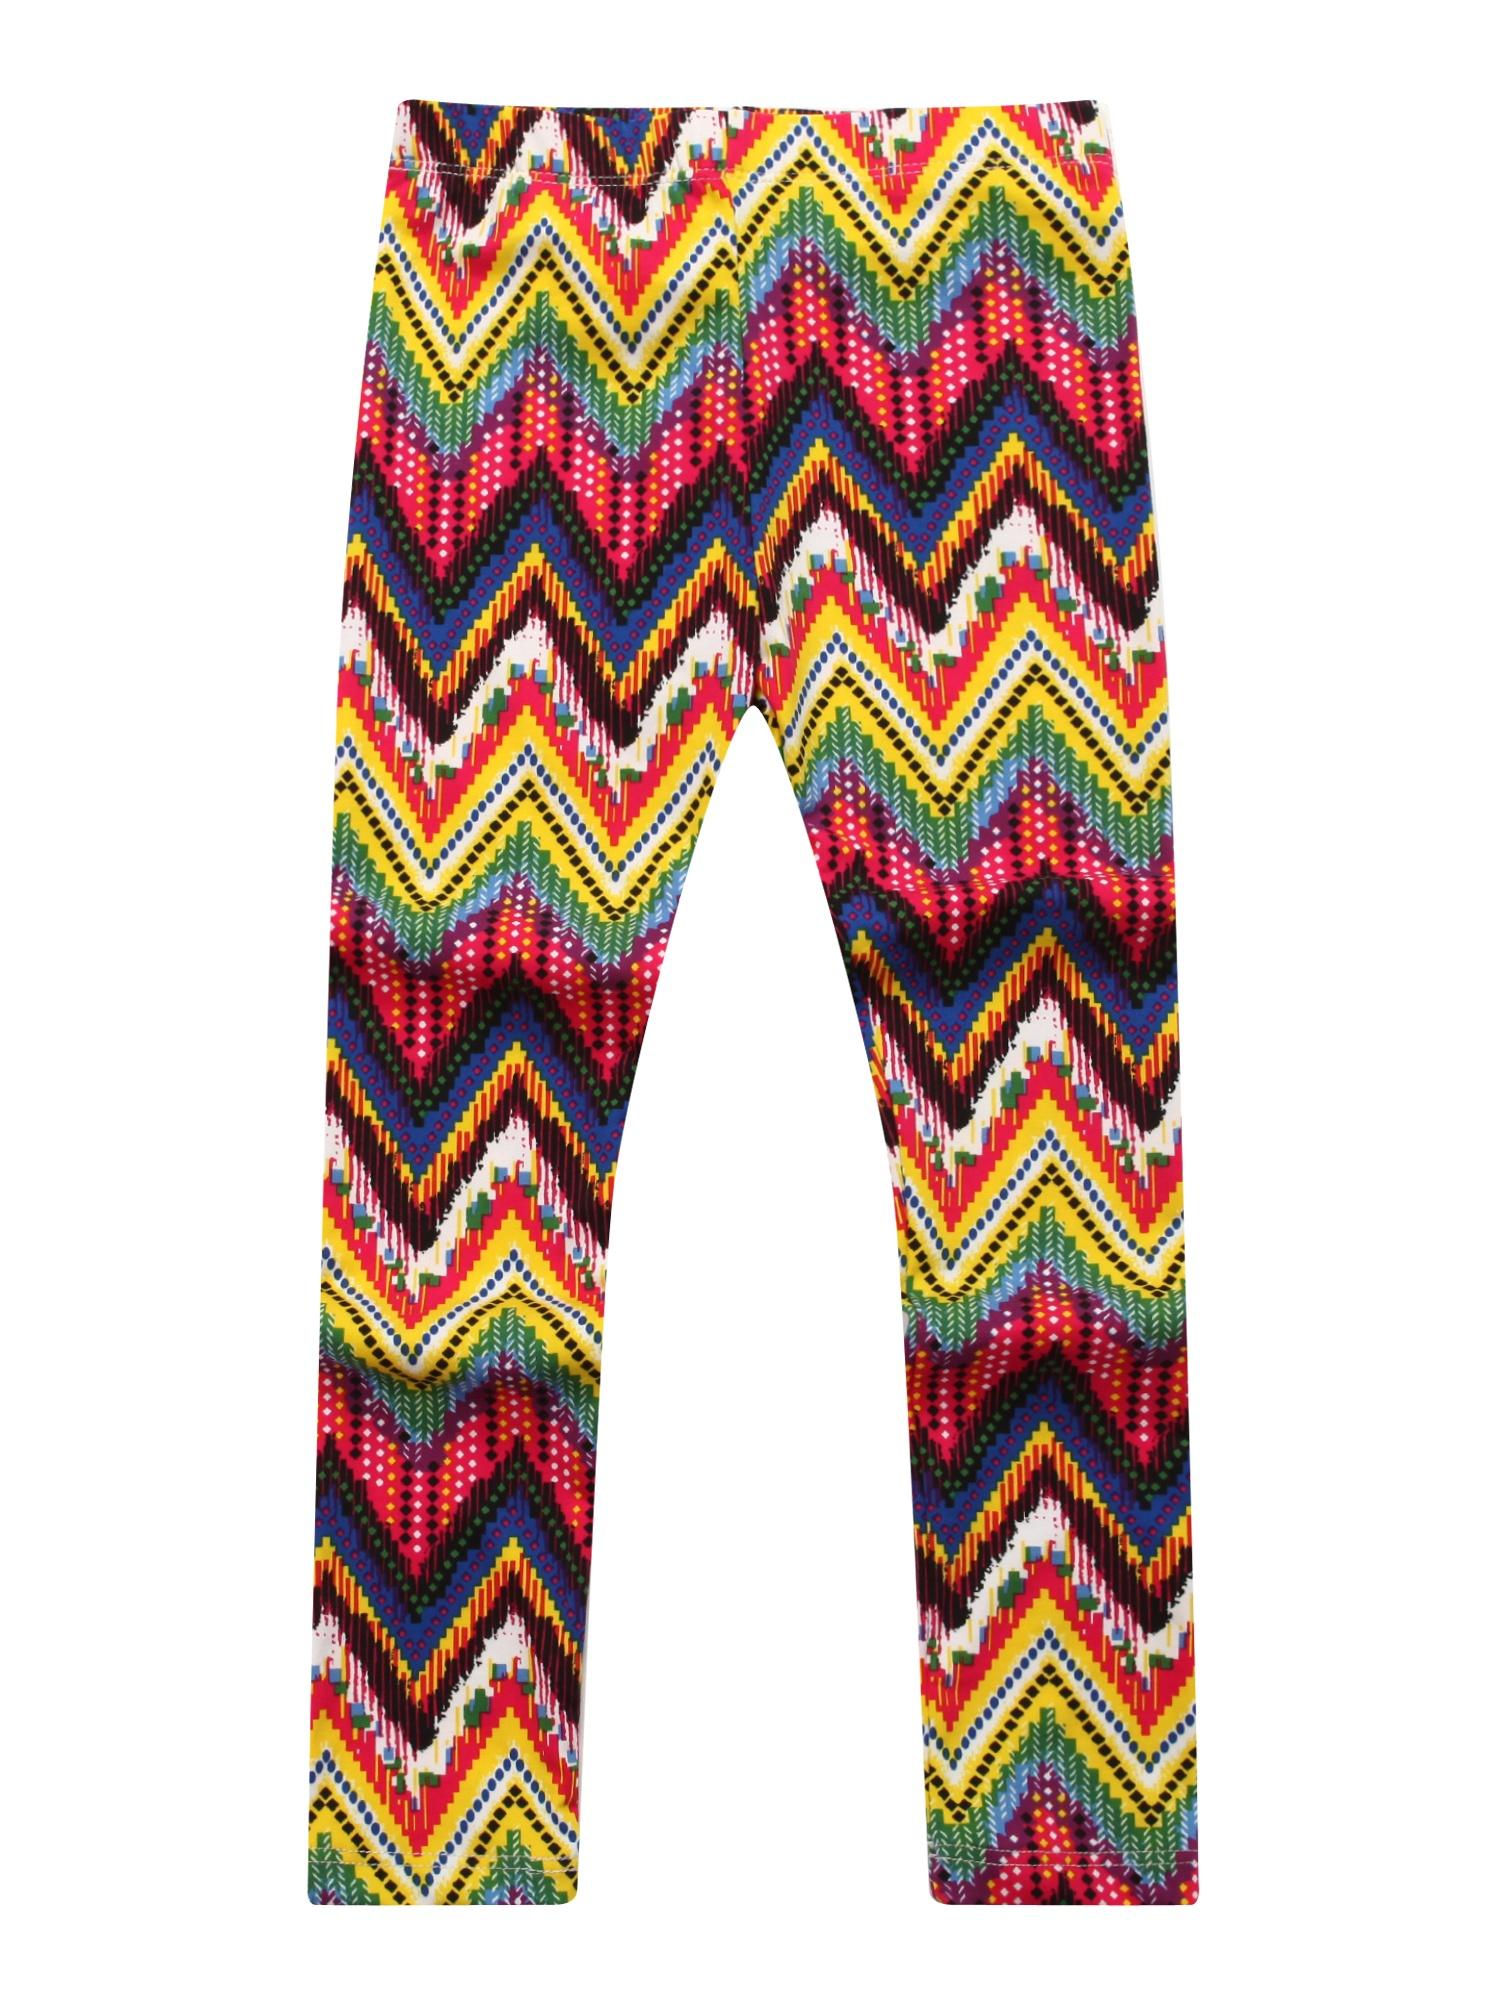 Richie House Girls' Patterned Stretch Pants RH0704